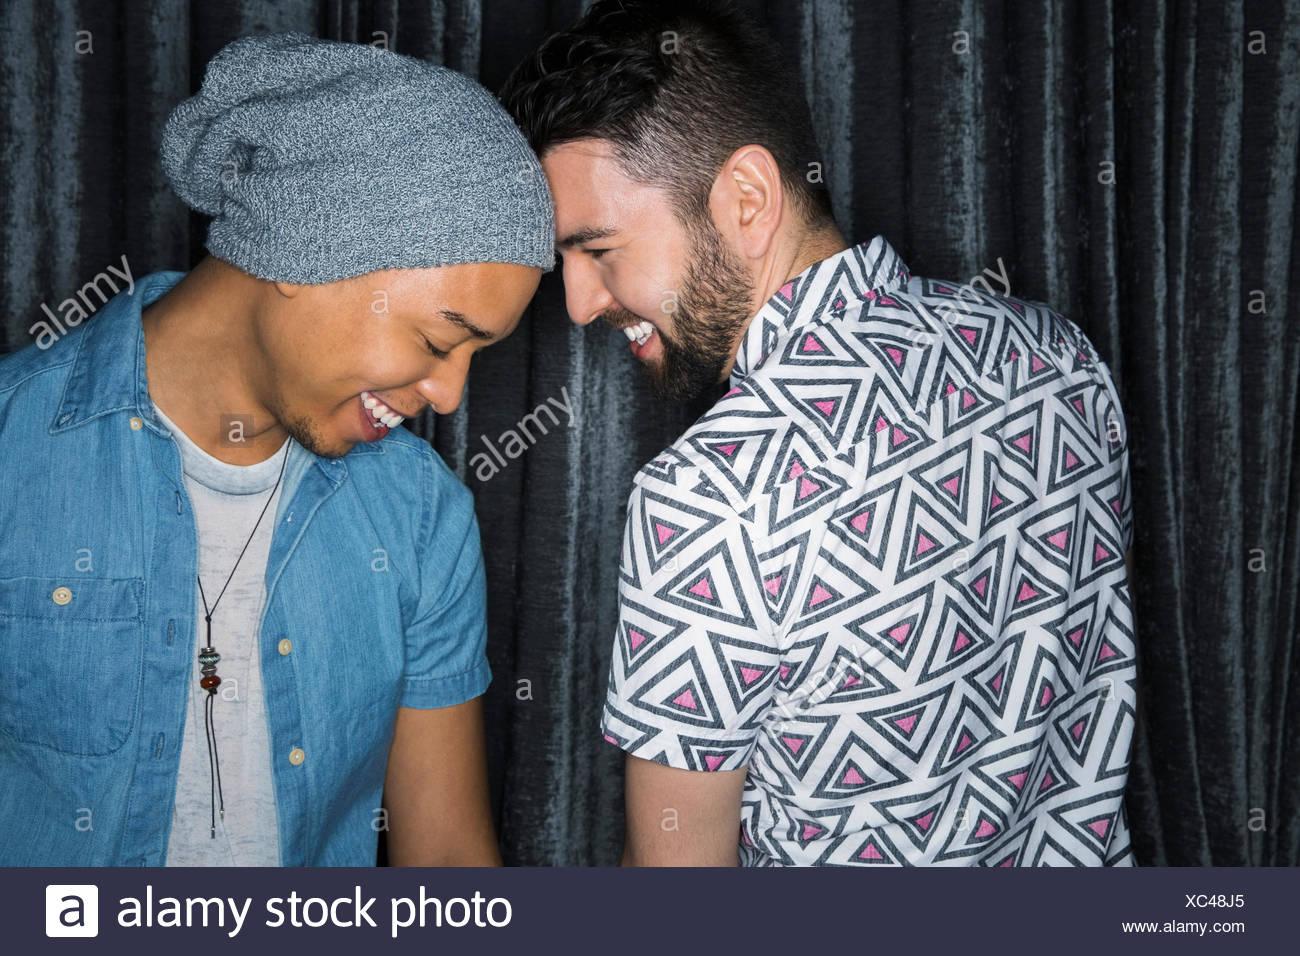 Homosexual men smiling head to head - Stock Image